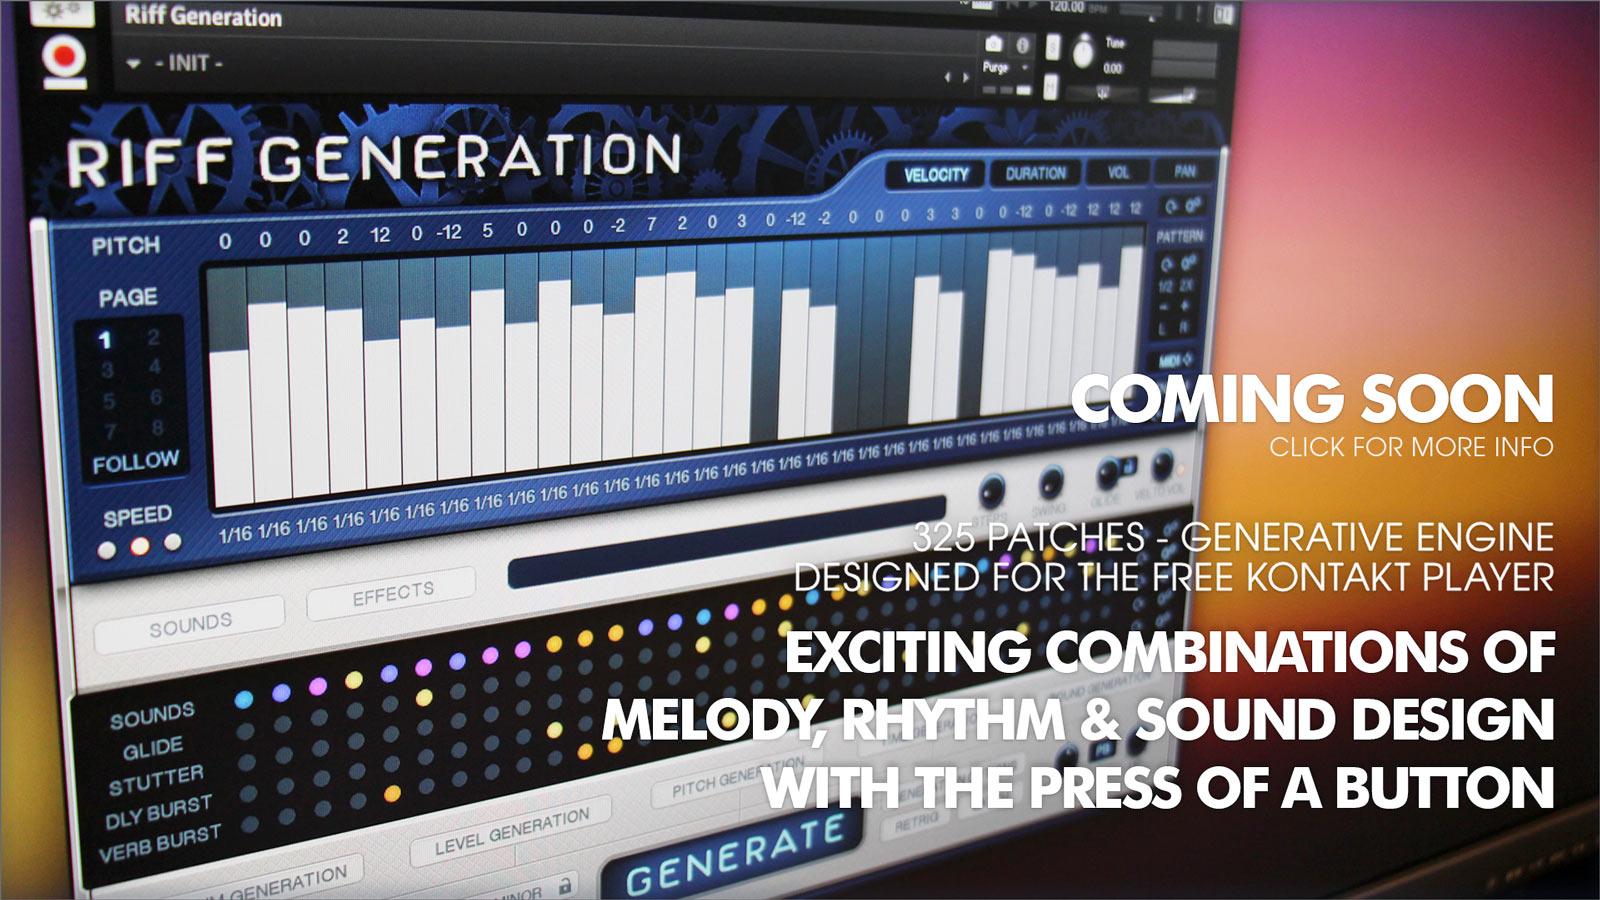 Riff Generation - Coming Soon